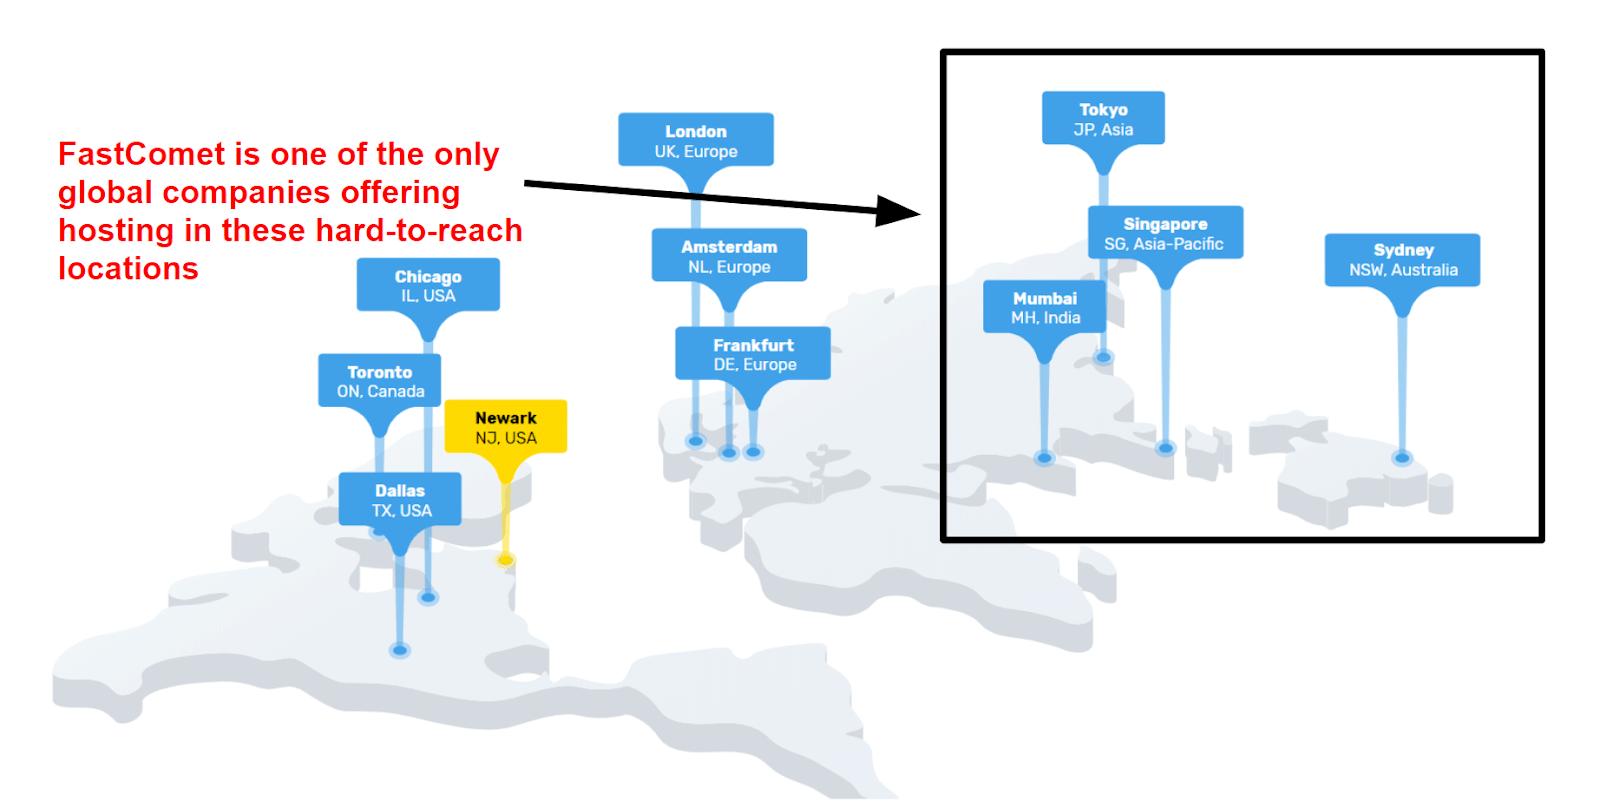 FastComet data center locations